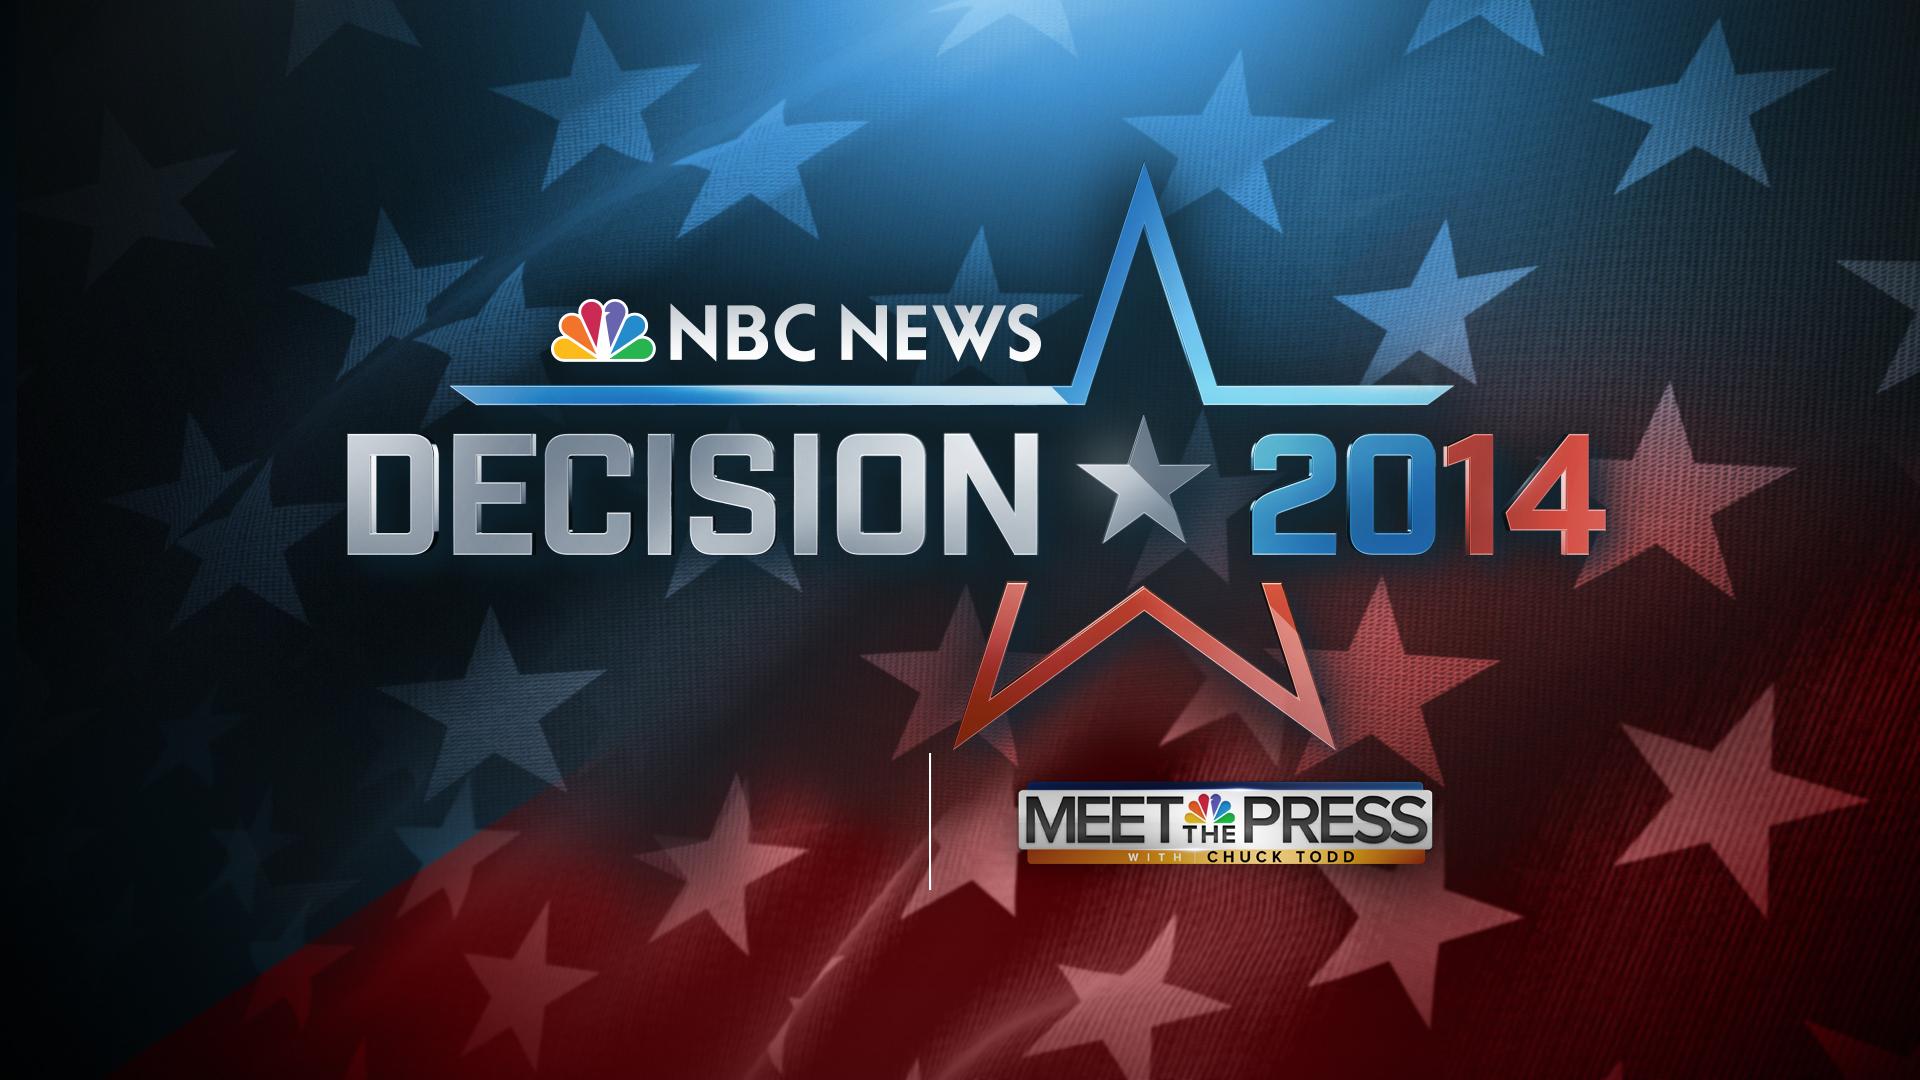 nbc meet the press 2014 gmc